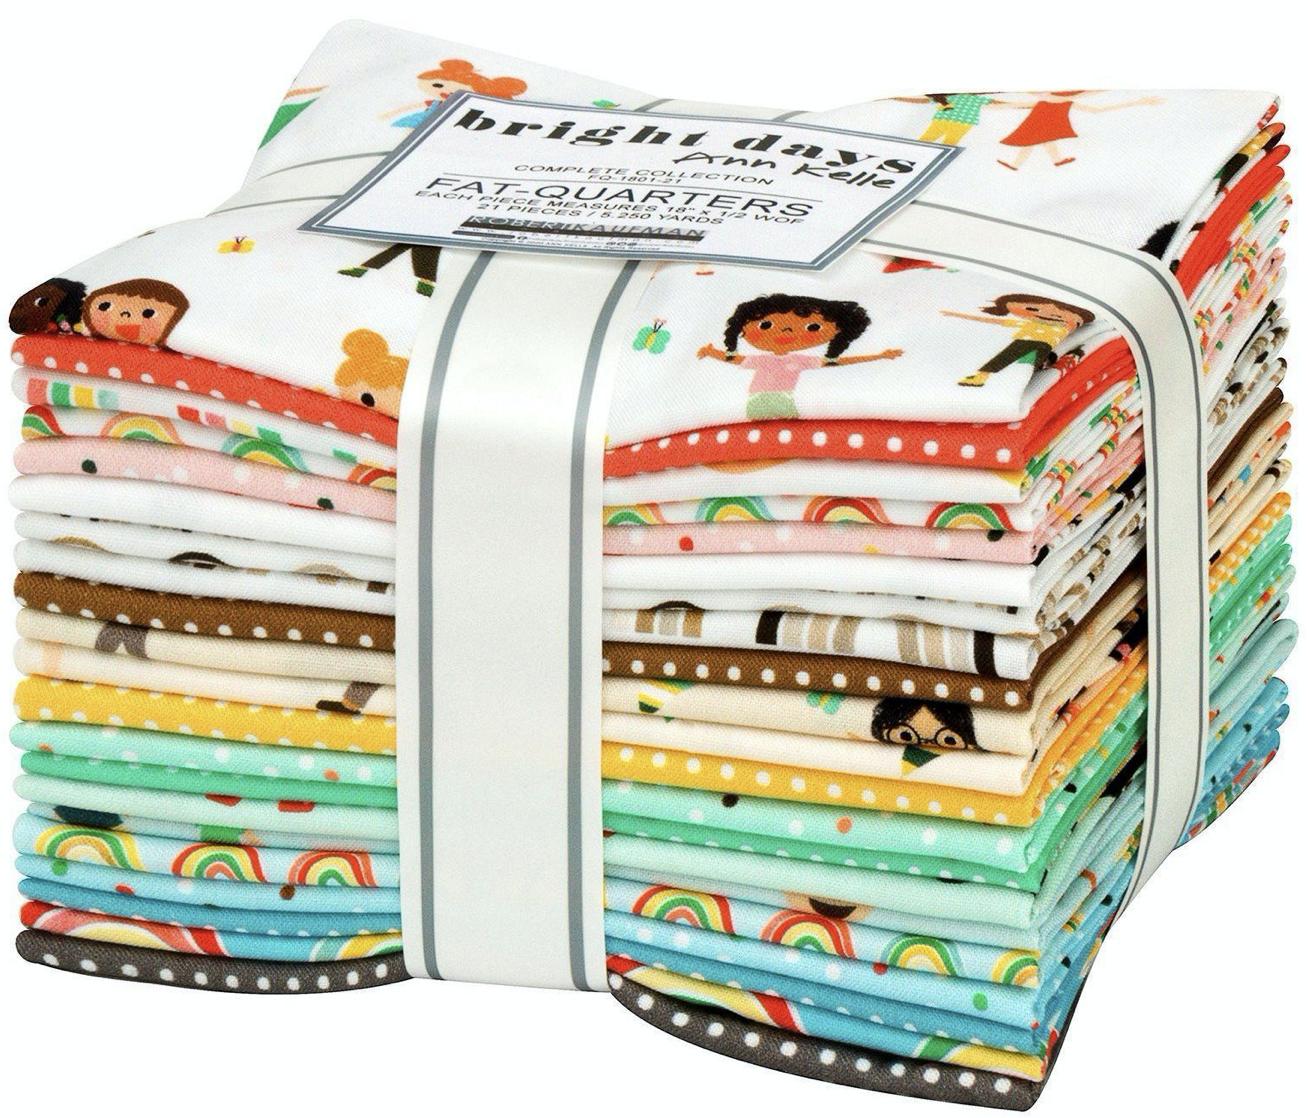 Modern Domestic 21 Piece Fat Quarter Bundle - Bright Days by Ann Kelle